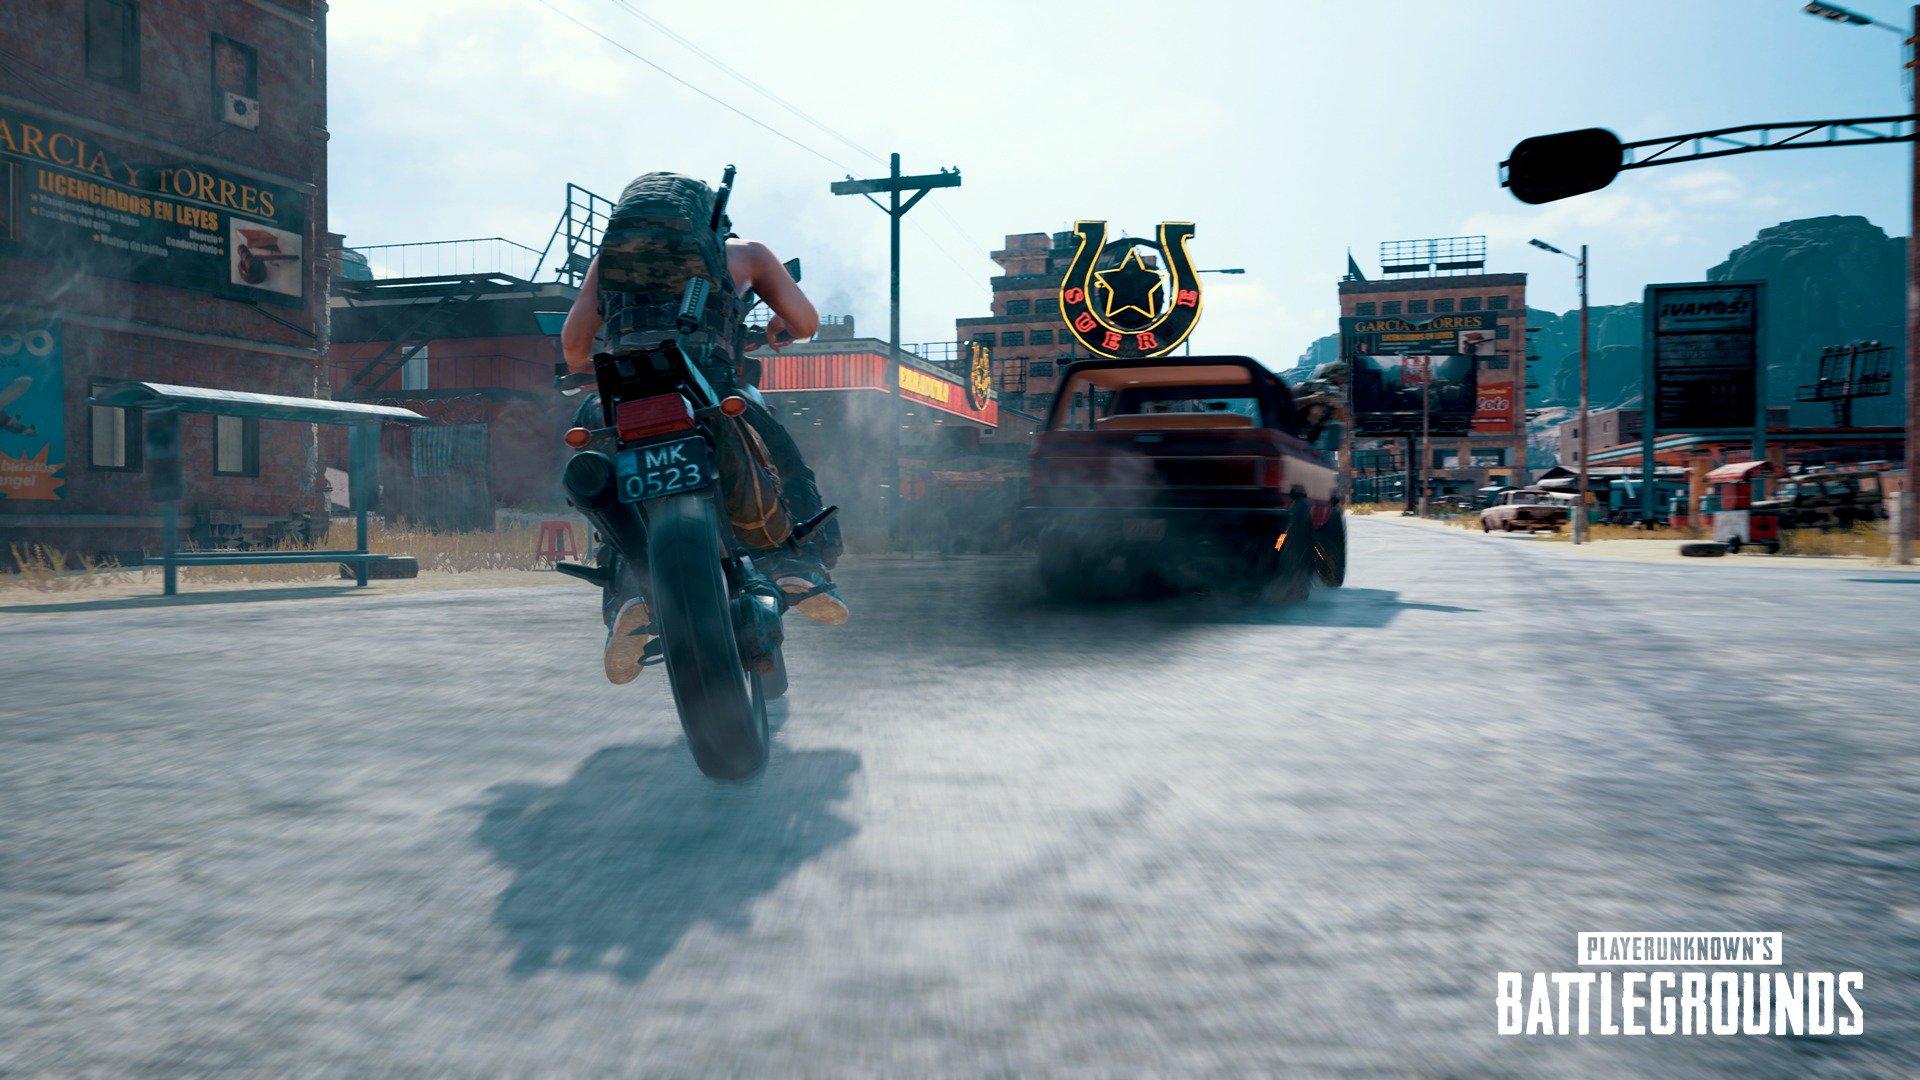 PlayerUnknown's Battlegrounds преодолел планку в 30 млн проданных копий на ПК и Xbox One